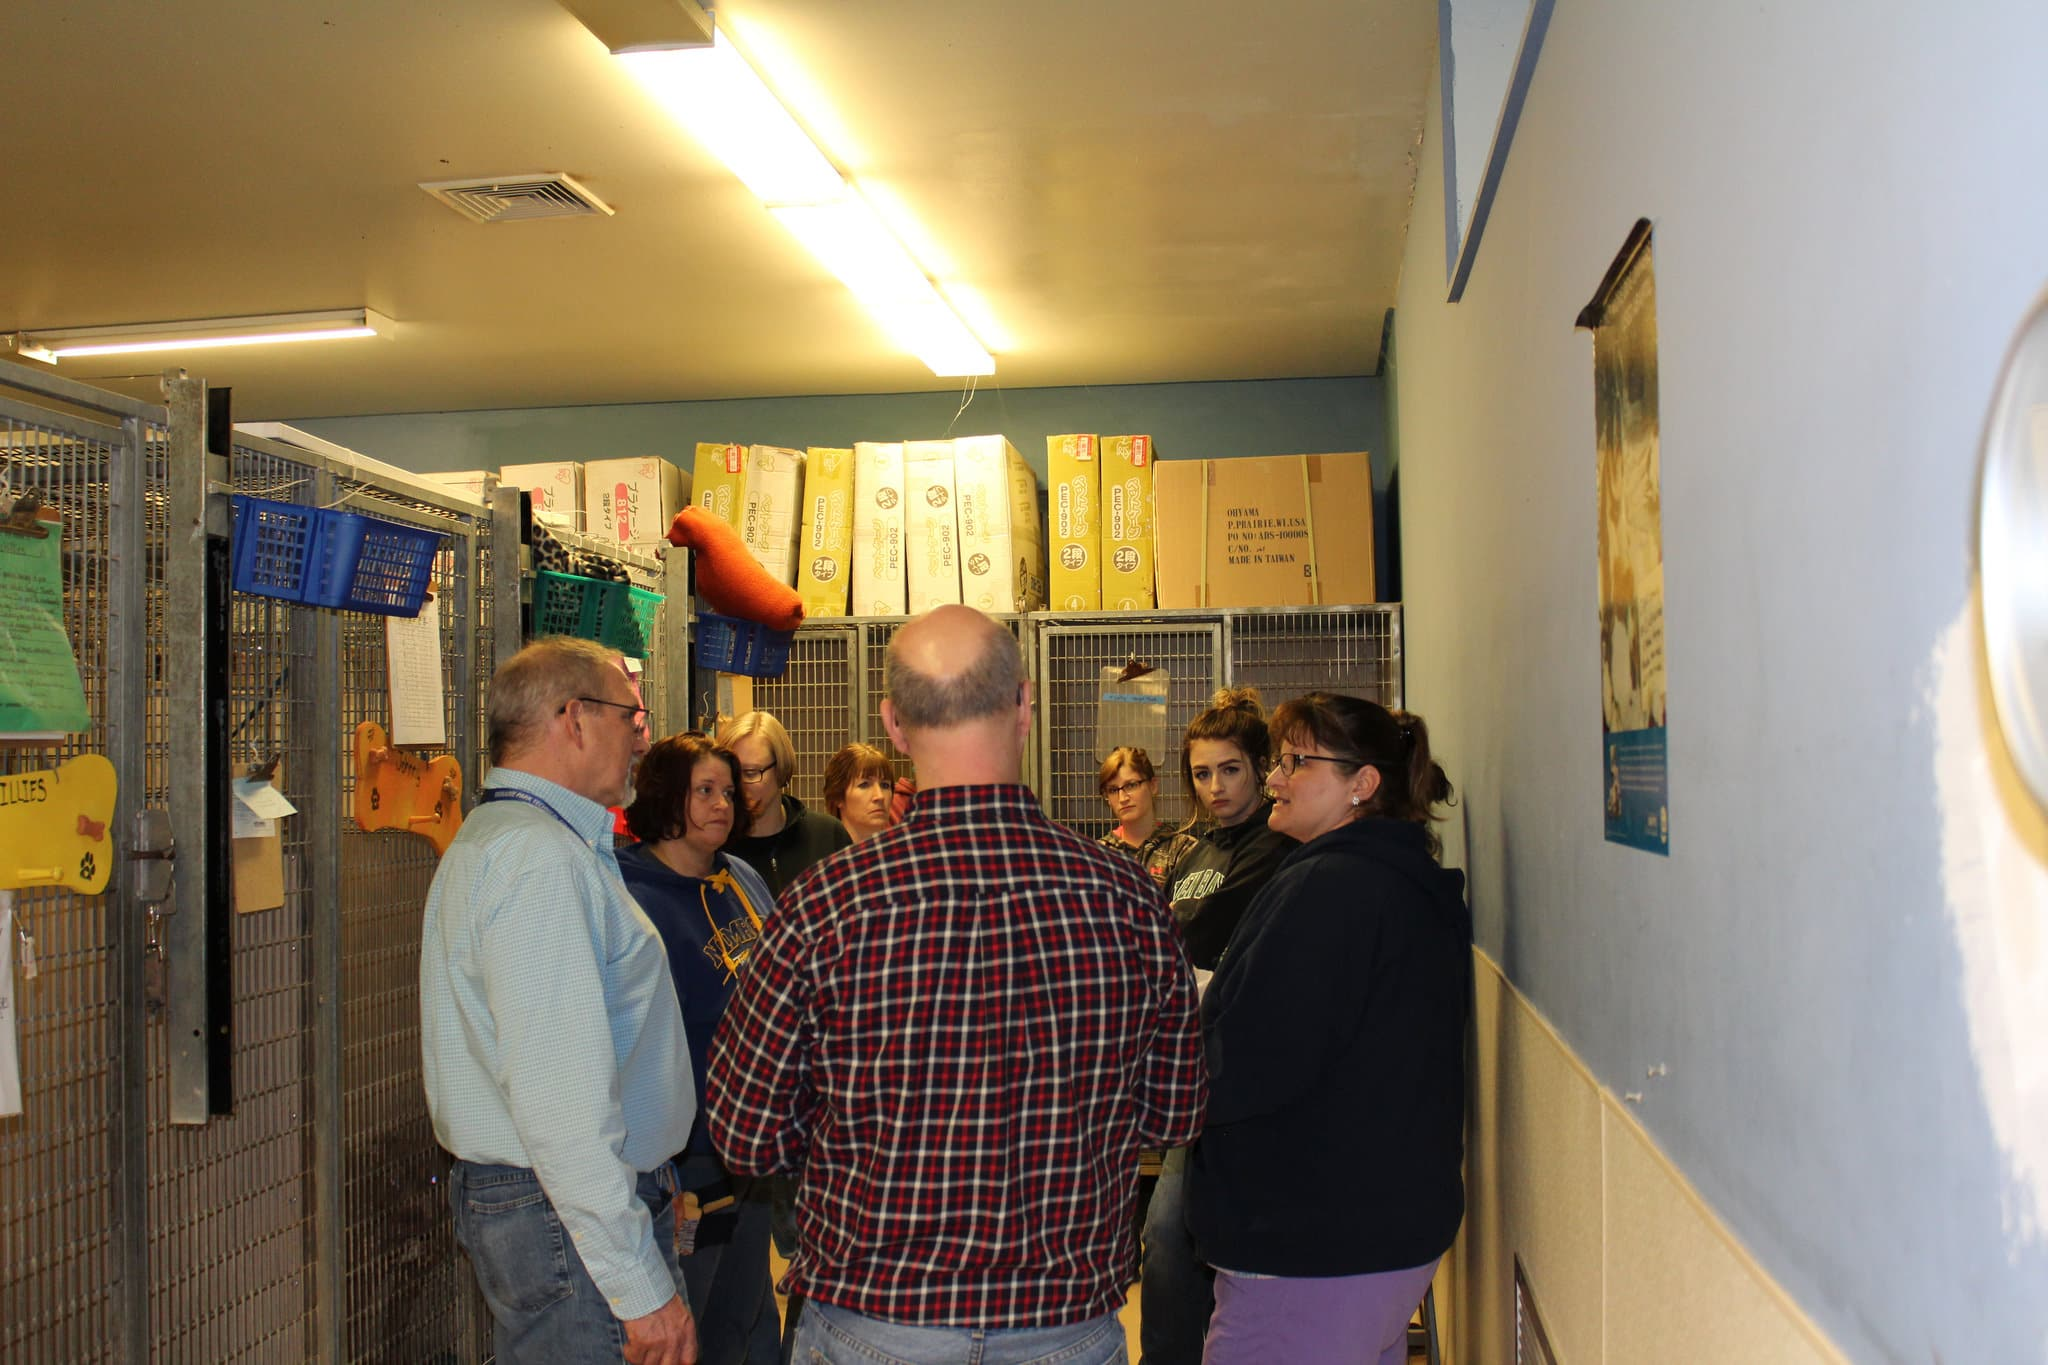 group talks in hallway of humane society